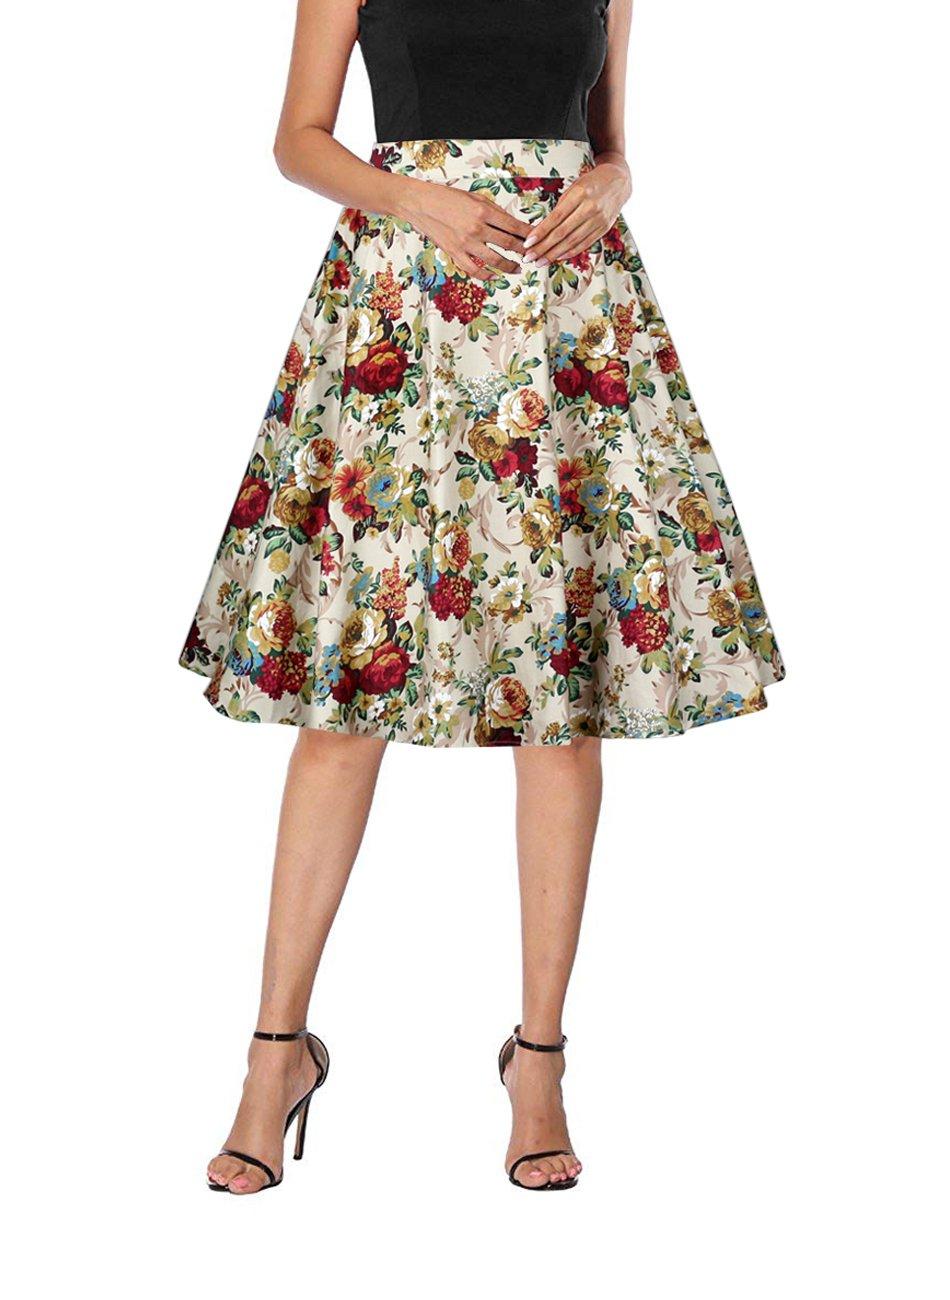 Yanmei Women's Retro Circle Swing Skirt for Summer Casual Vintage Flare Skirt Beige Medium 1086-3